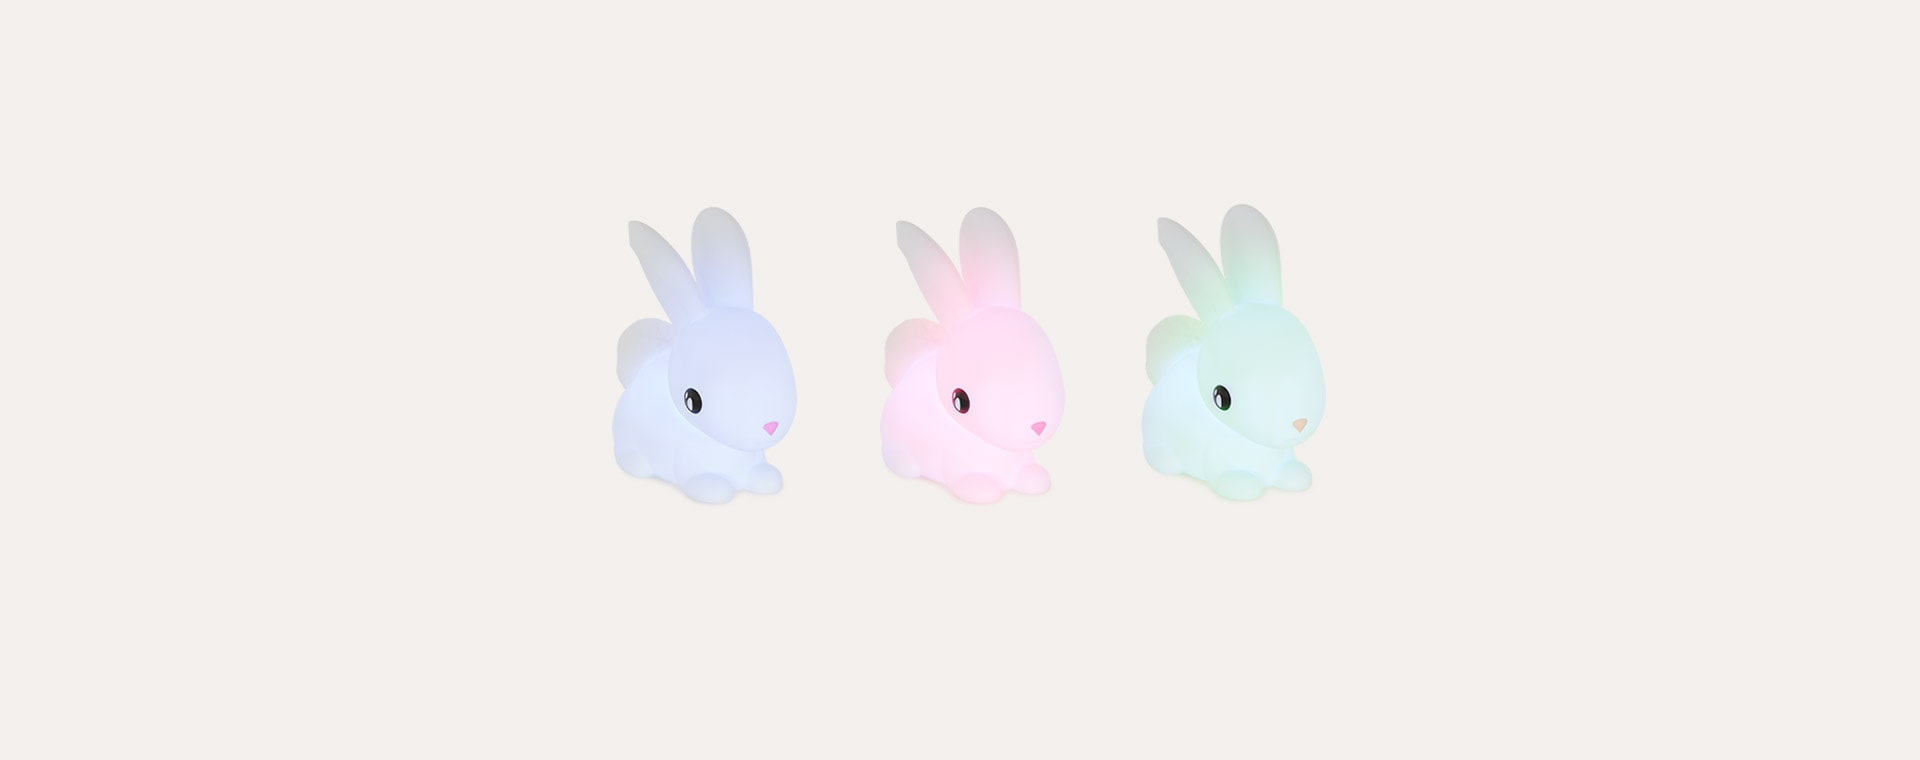 White Dhink Bunny LED Night Light